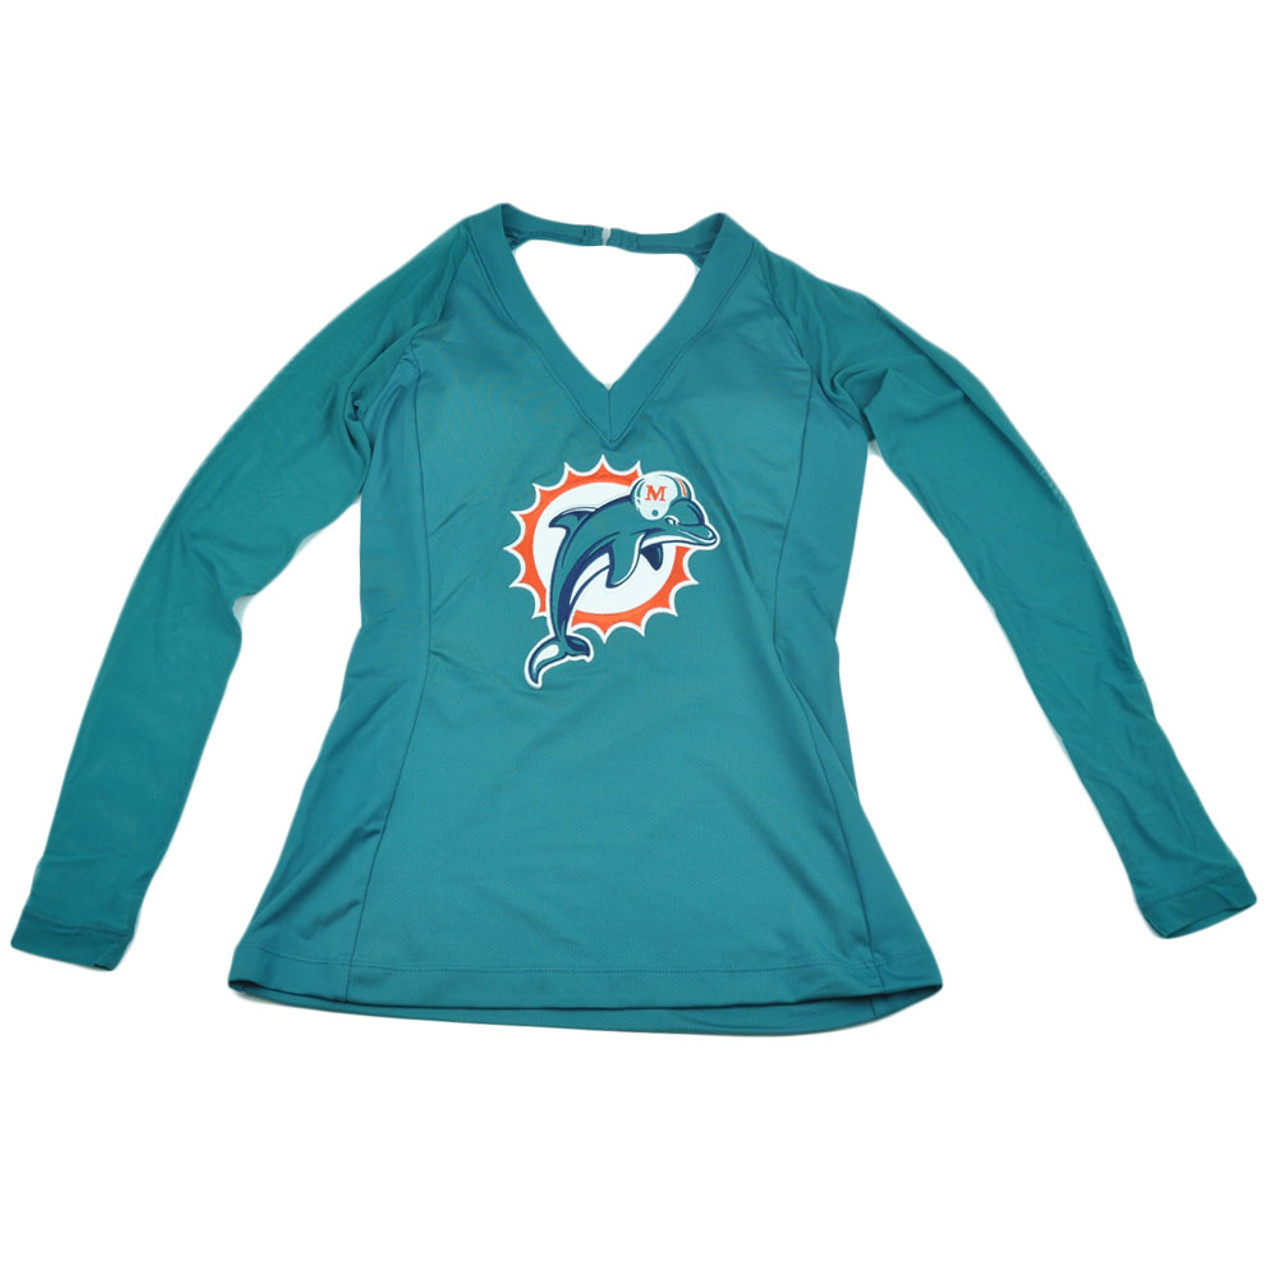 separation shoes b2236 792dc NFL Miami Dolphins Wildkat Mesh Jersey Women Ladies Long Sleeve Shirt